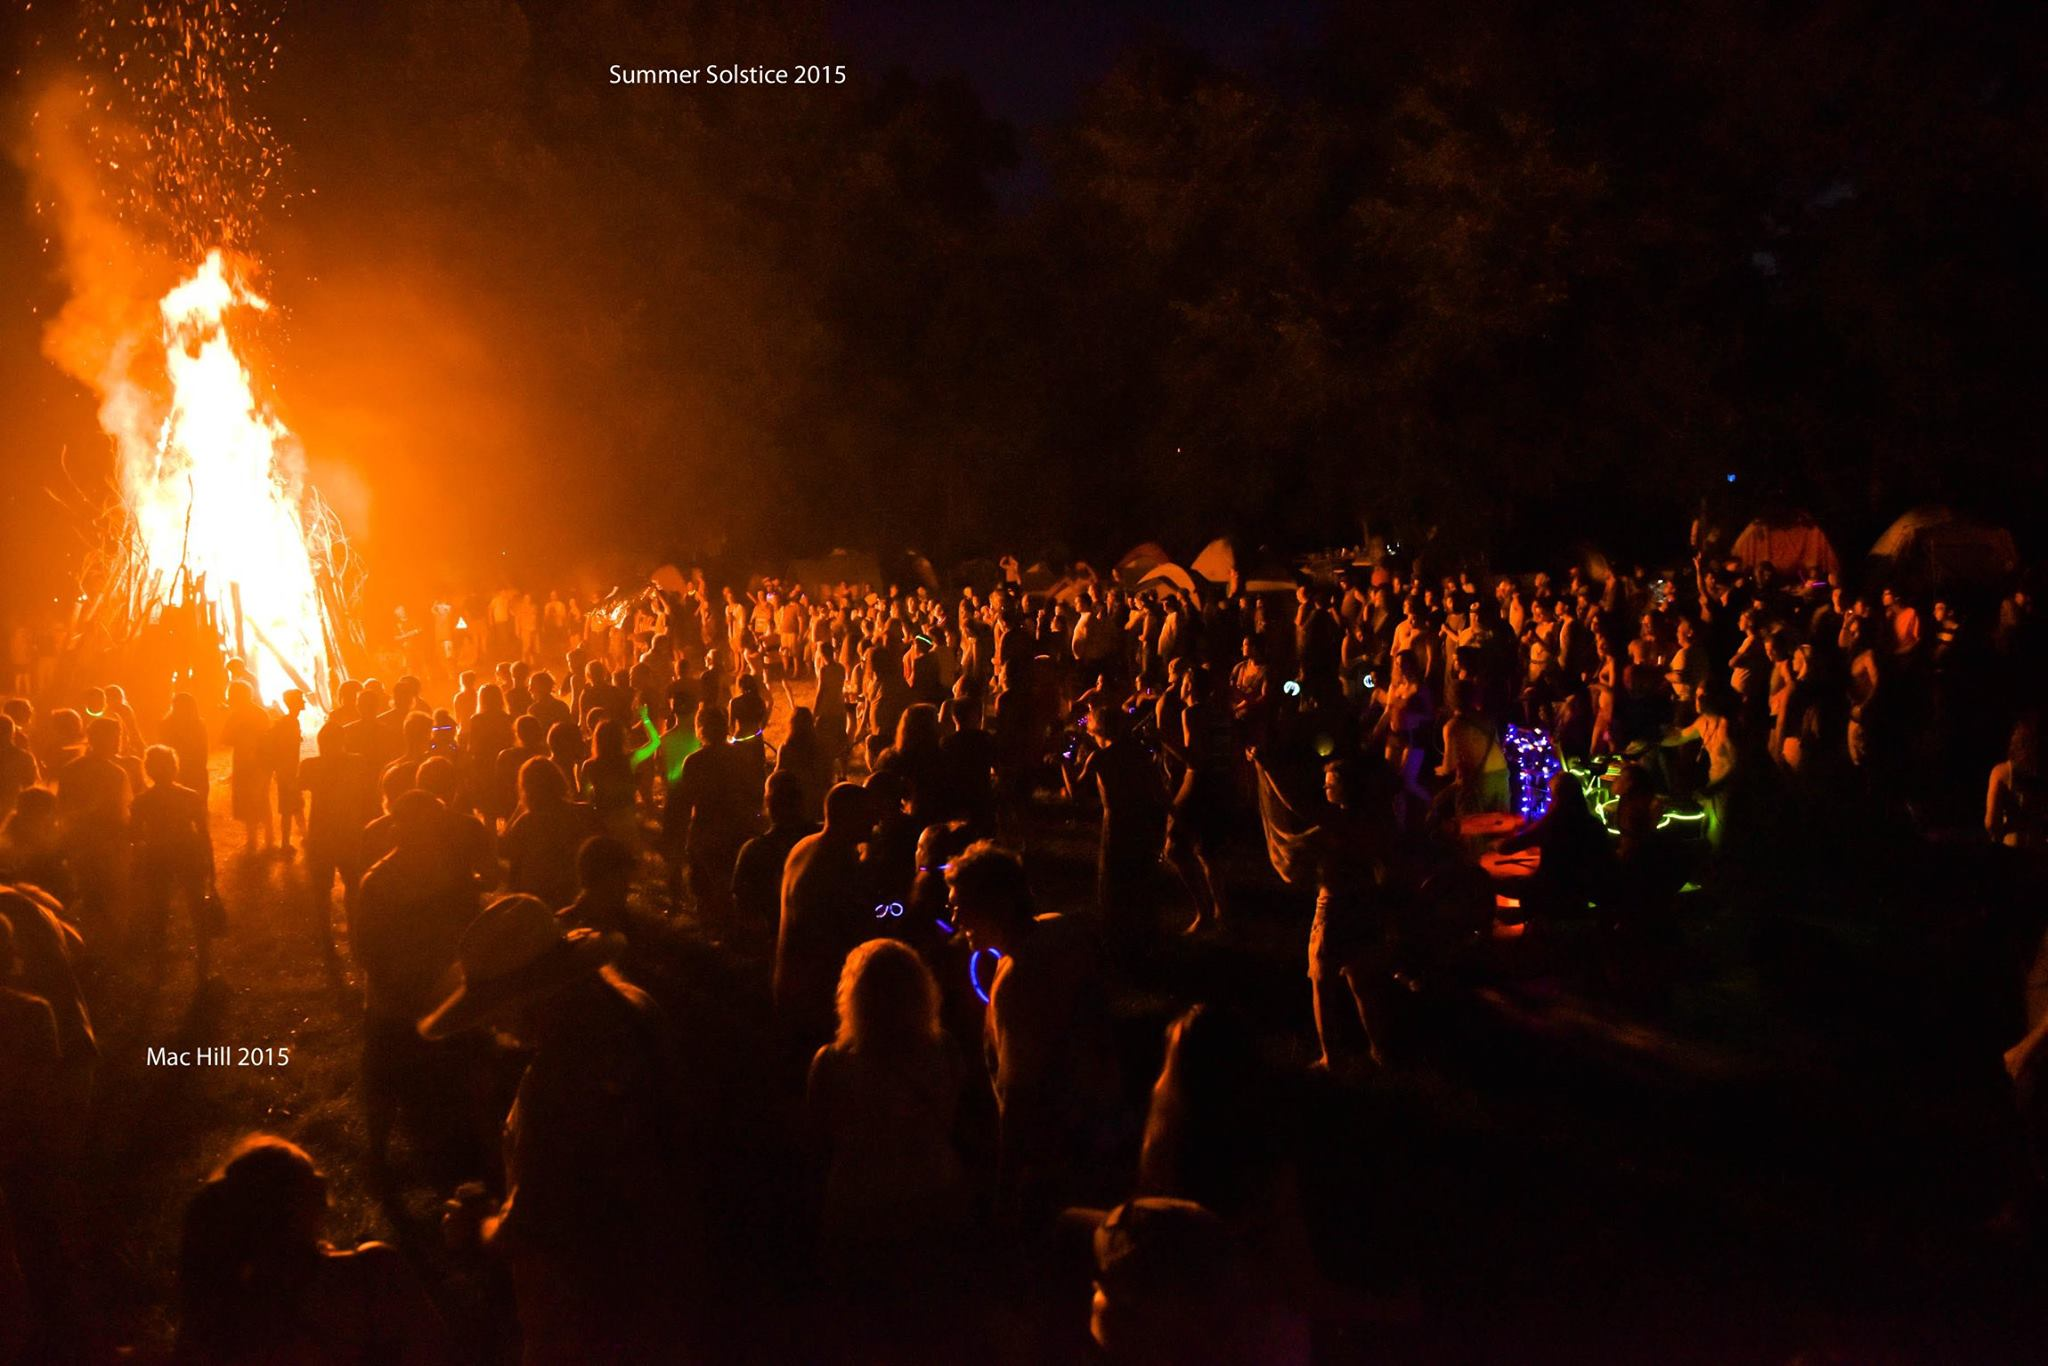 fire, music festival, crowd, trippy